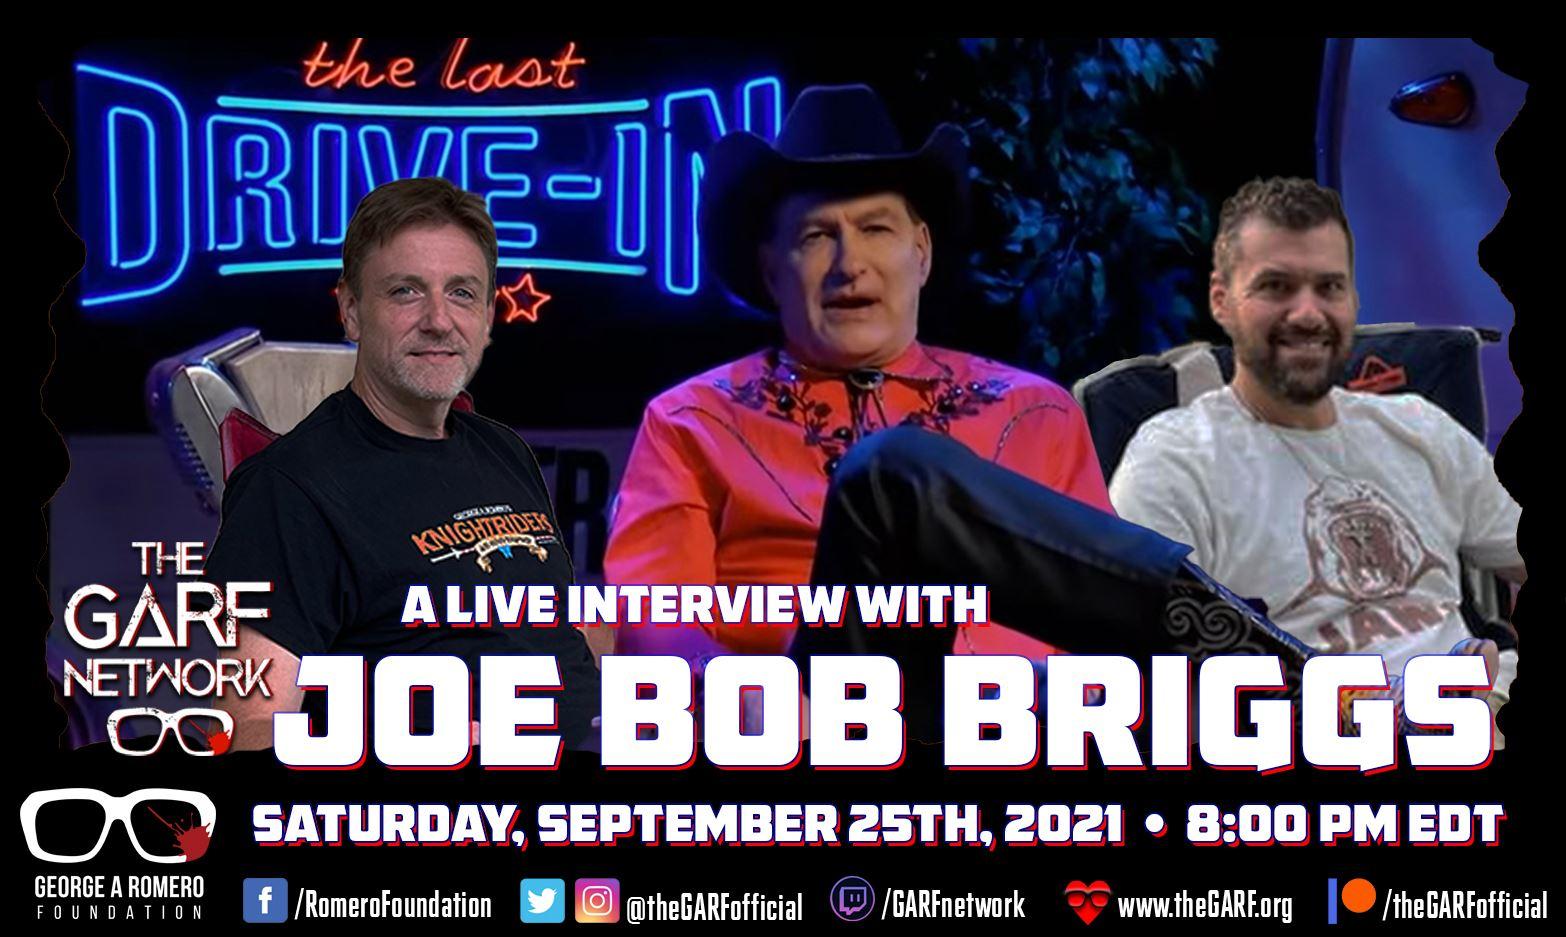 Joe-Bob-Briggs-GARF-Promo